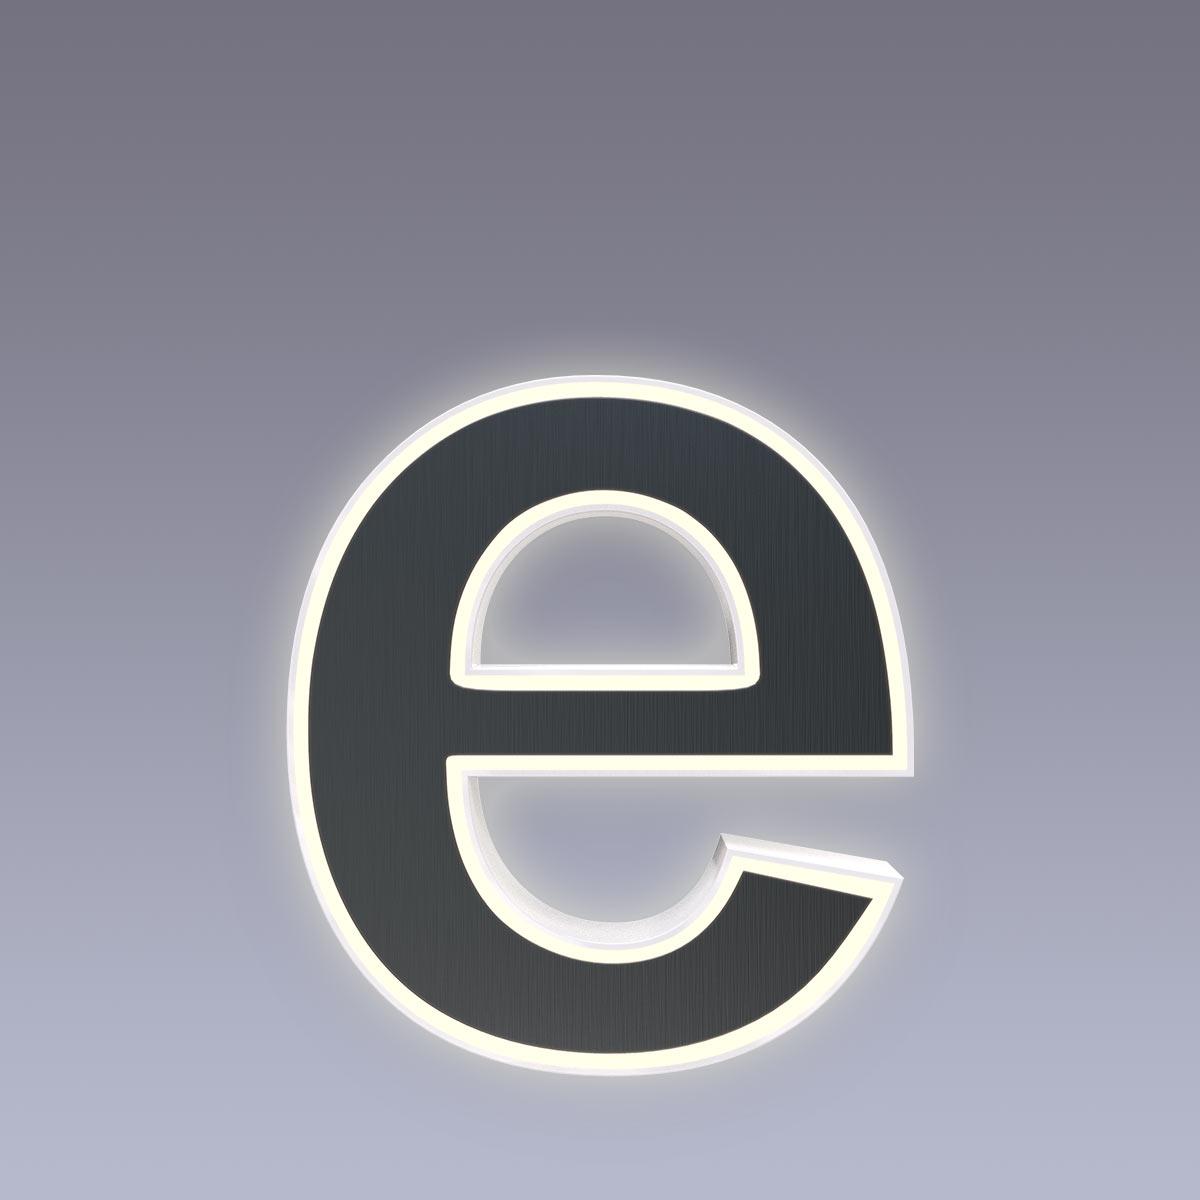 Cover für 15cm Hausnummer e Edelstahl anthrazit RAL7016 Arial selbstklebend